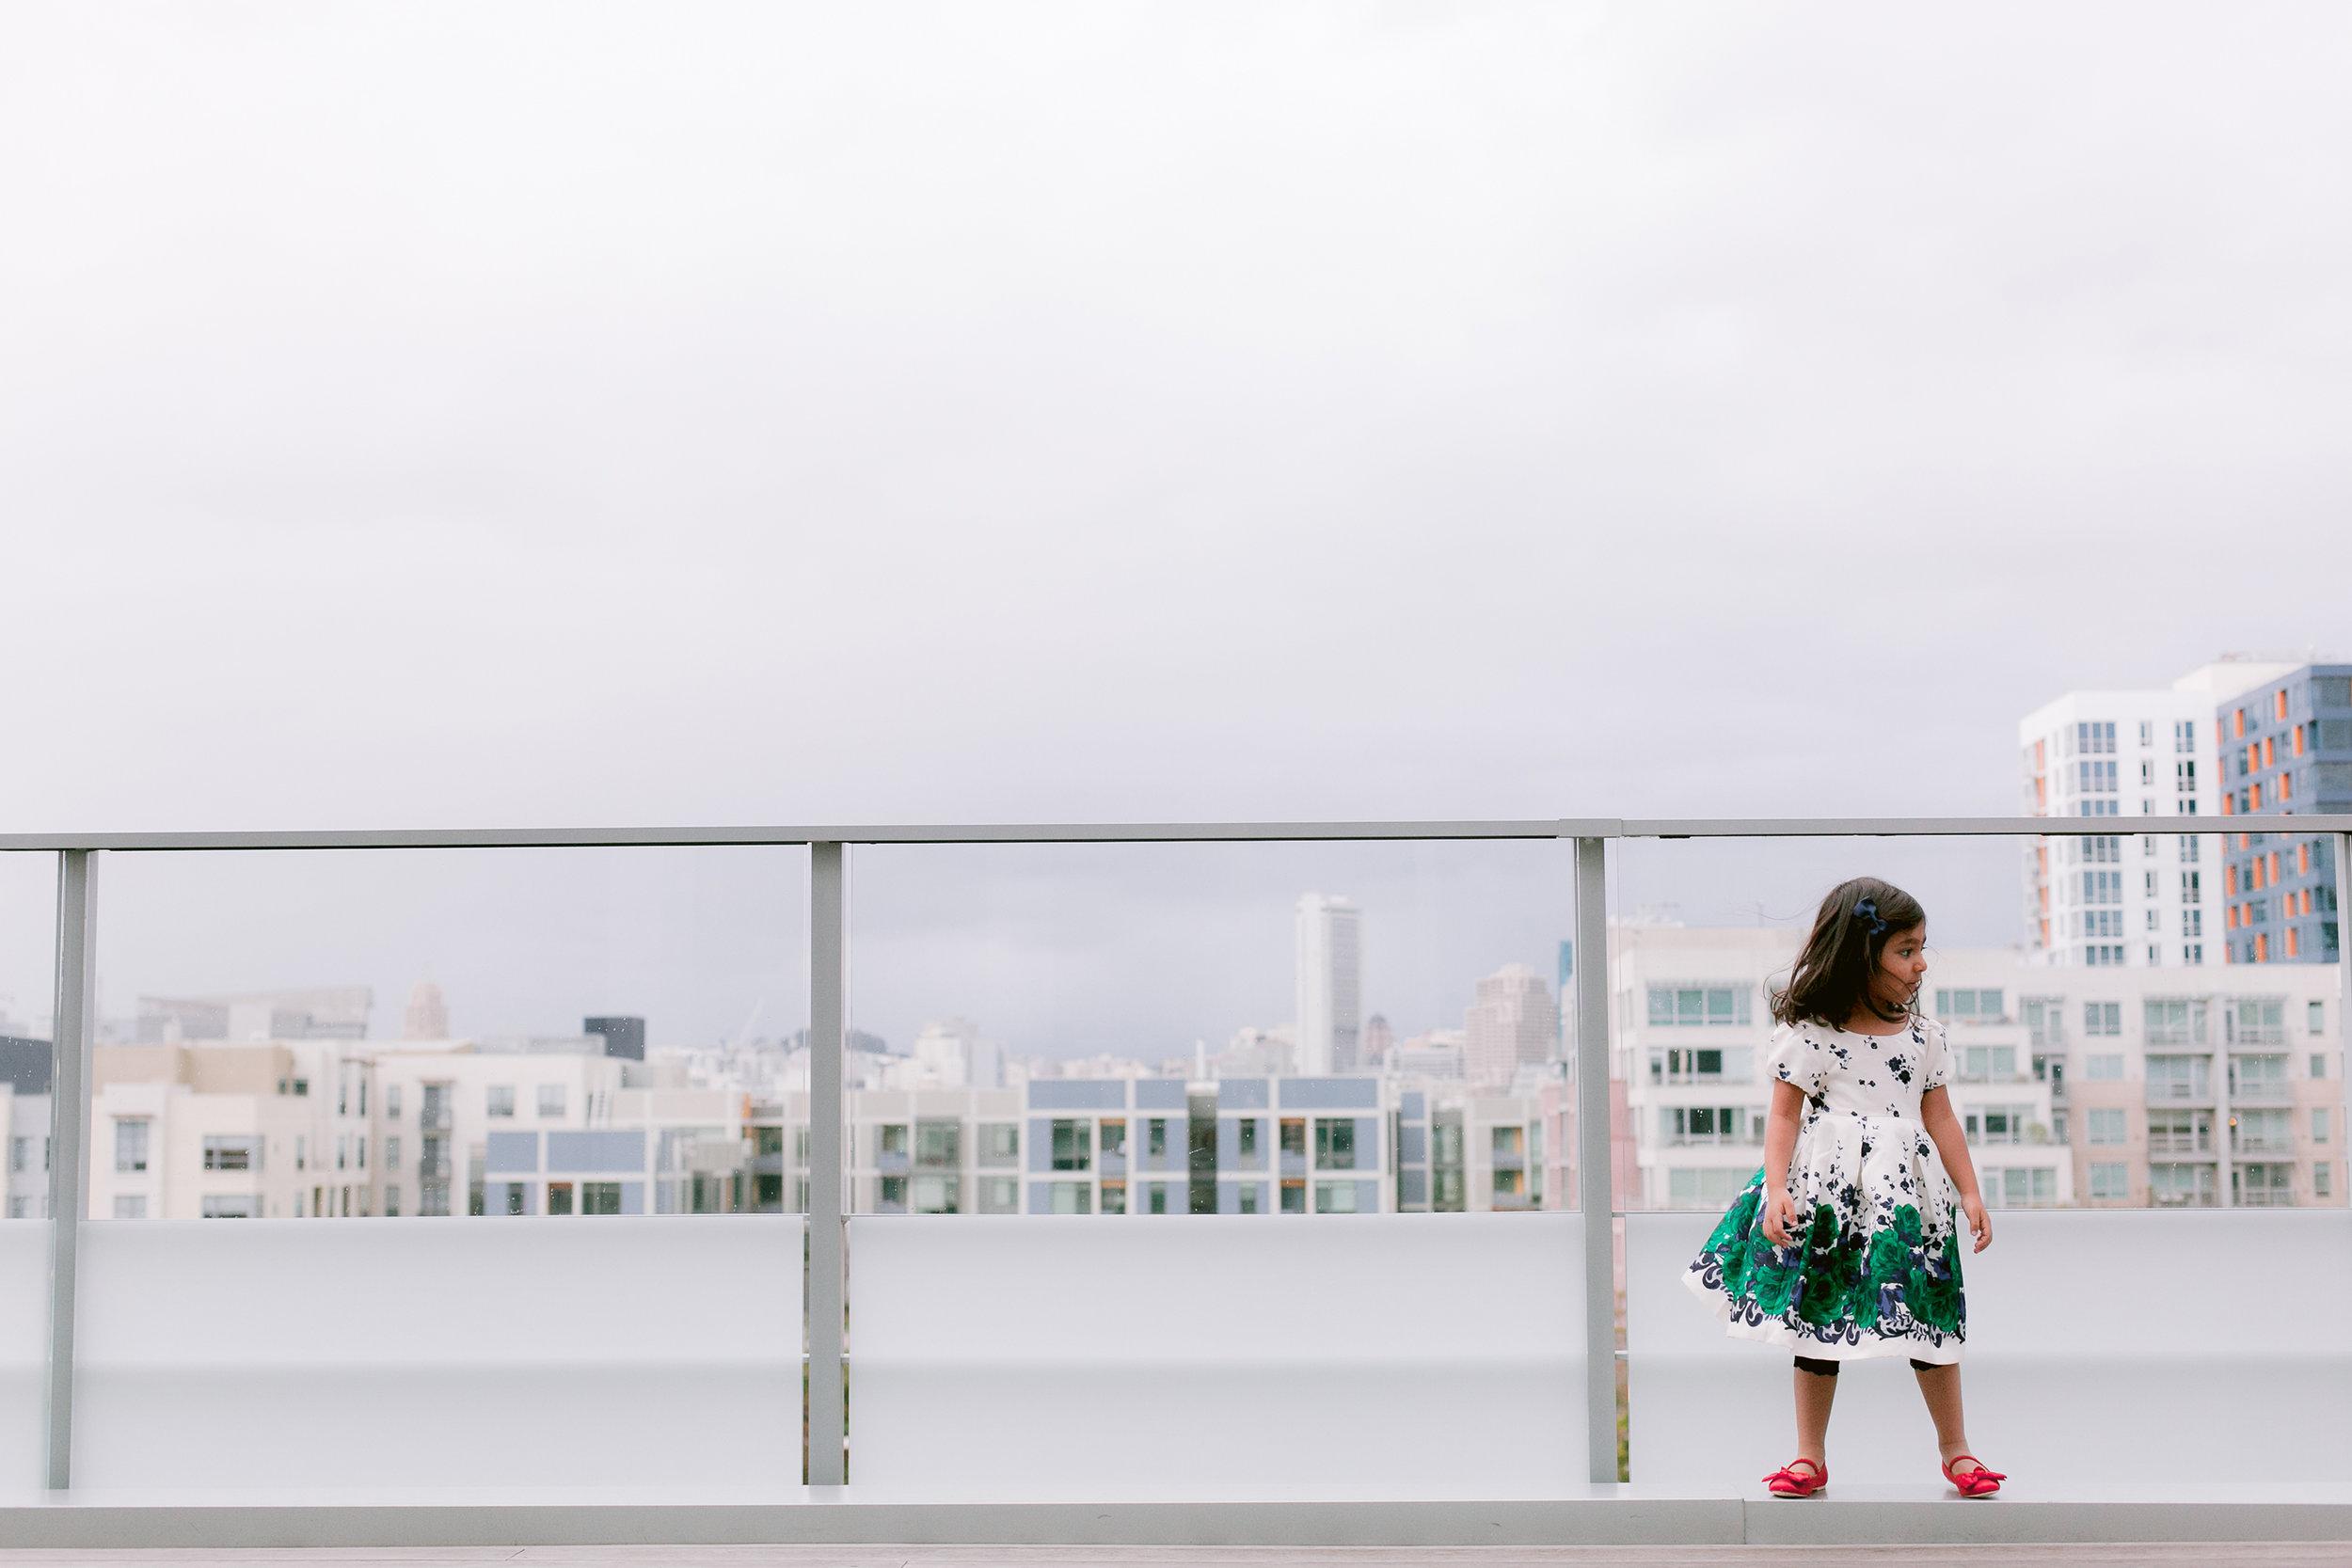 San_Francisco_Children_and_Family_Portrait_012.jpg